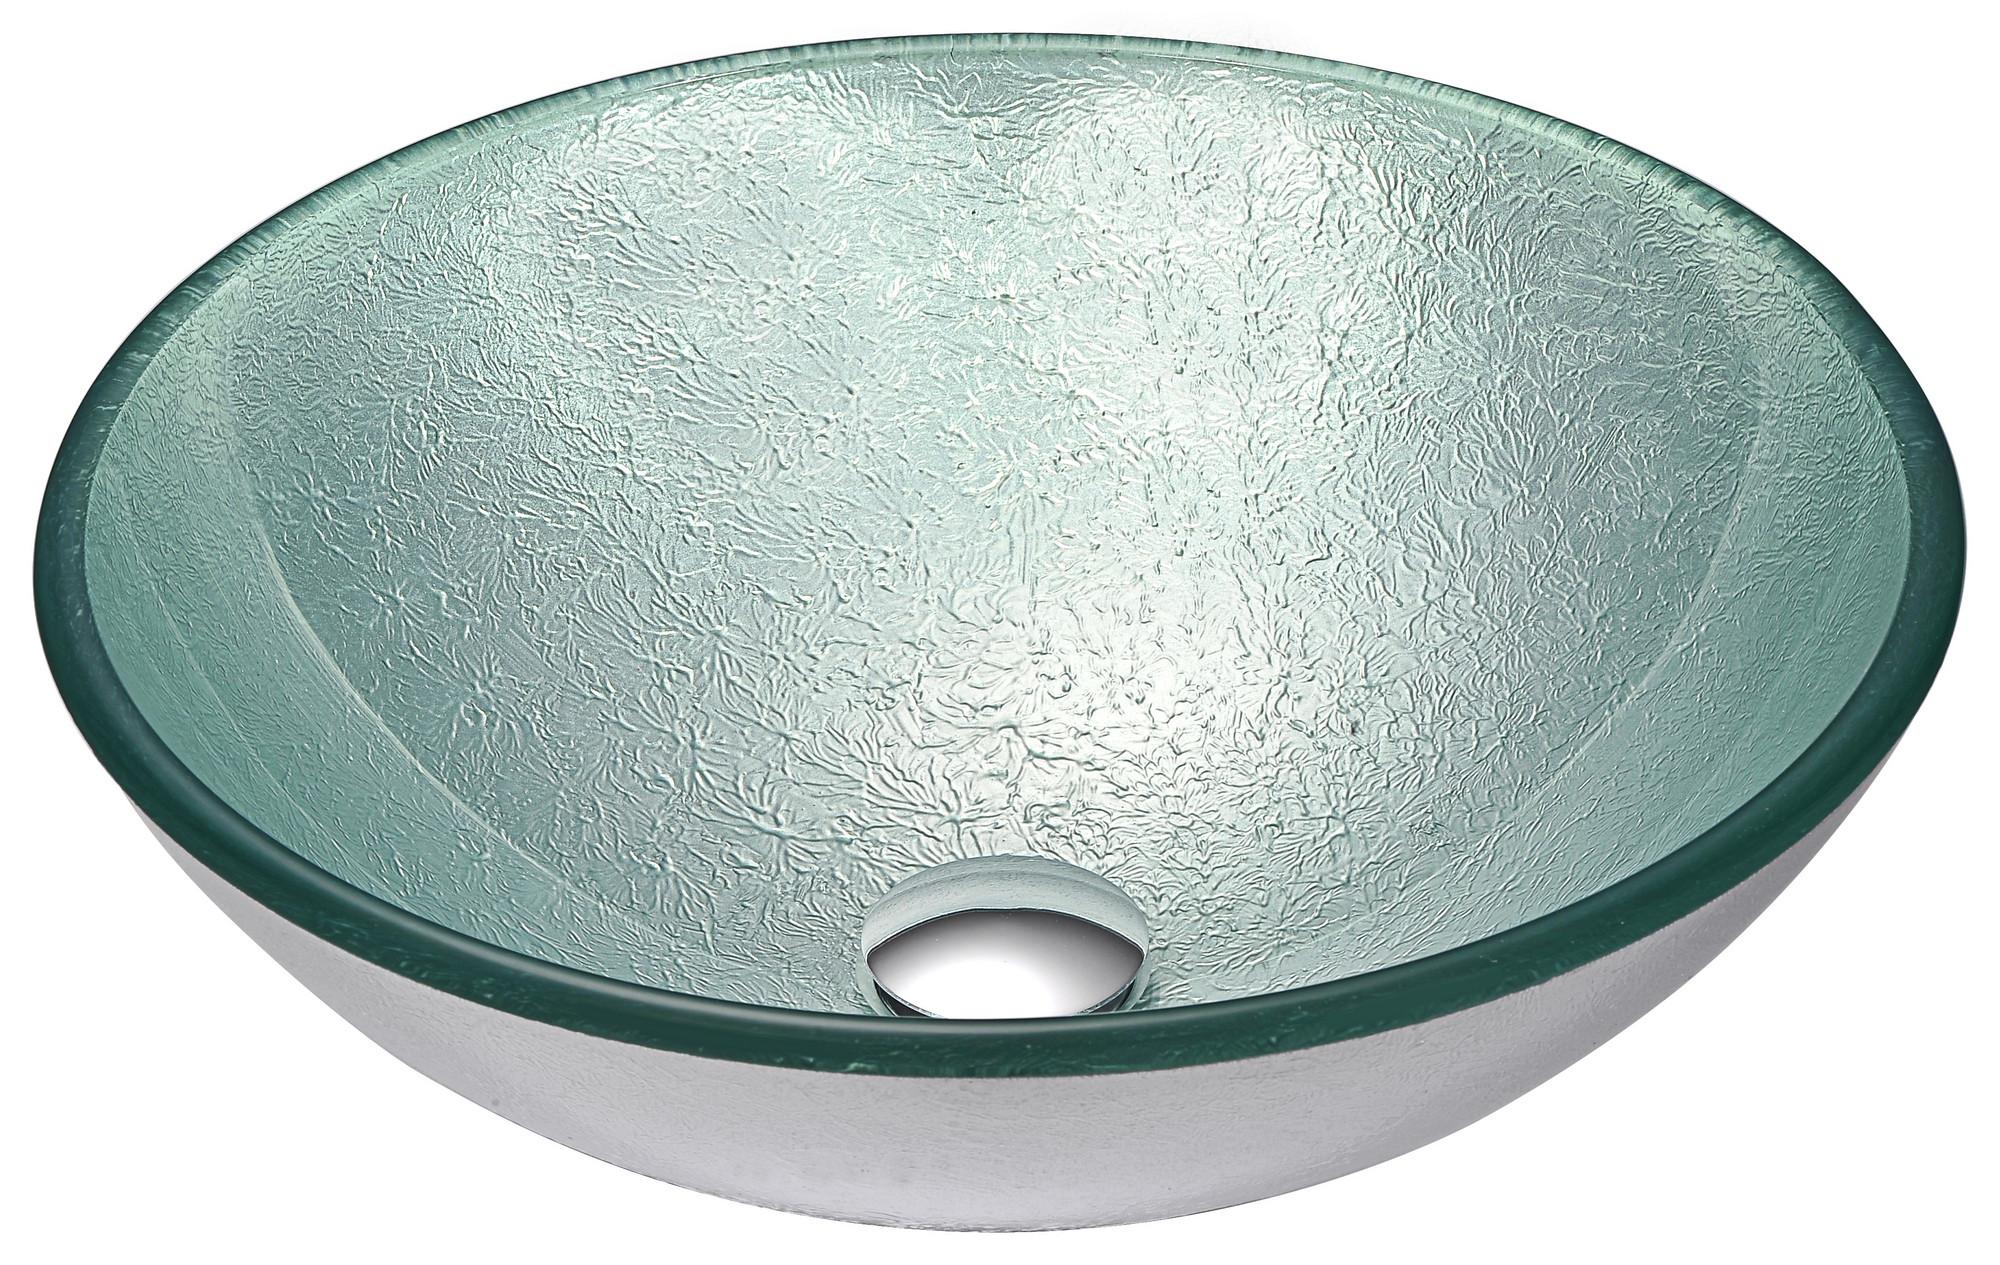 ANZZI LS-AZ055 Spirito Series Deco-Glass Vessel Sink In Churning Silver